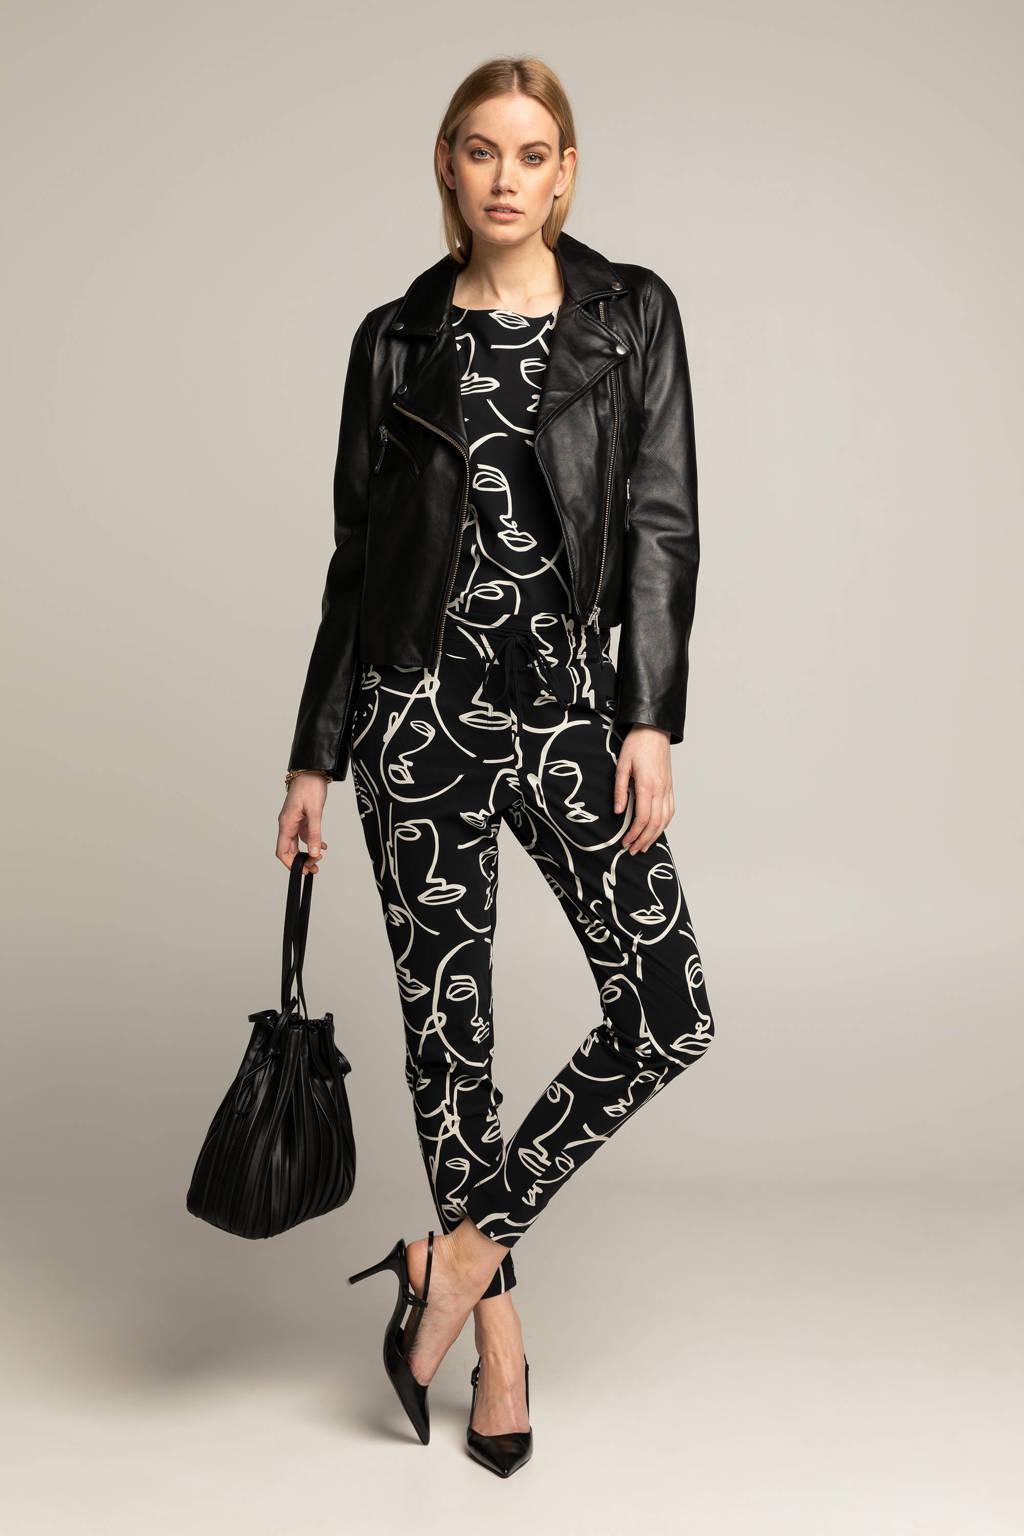 Expresso slim fit pantalon BFARAH met all over print zwart/wit, Zwart/wit